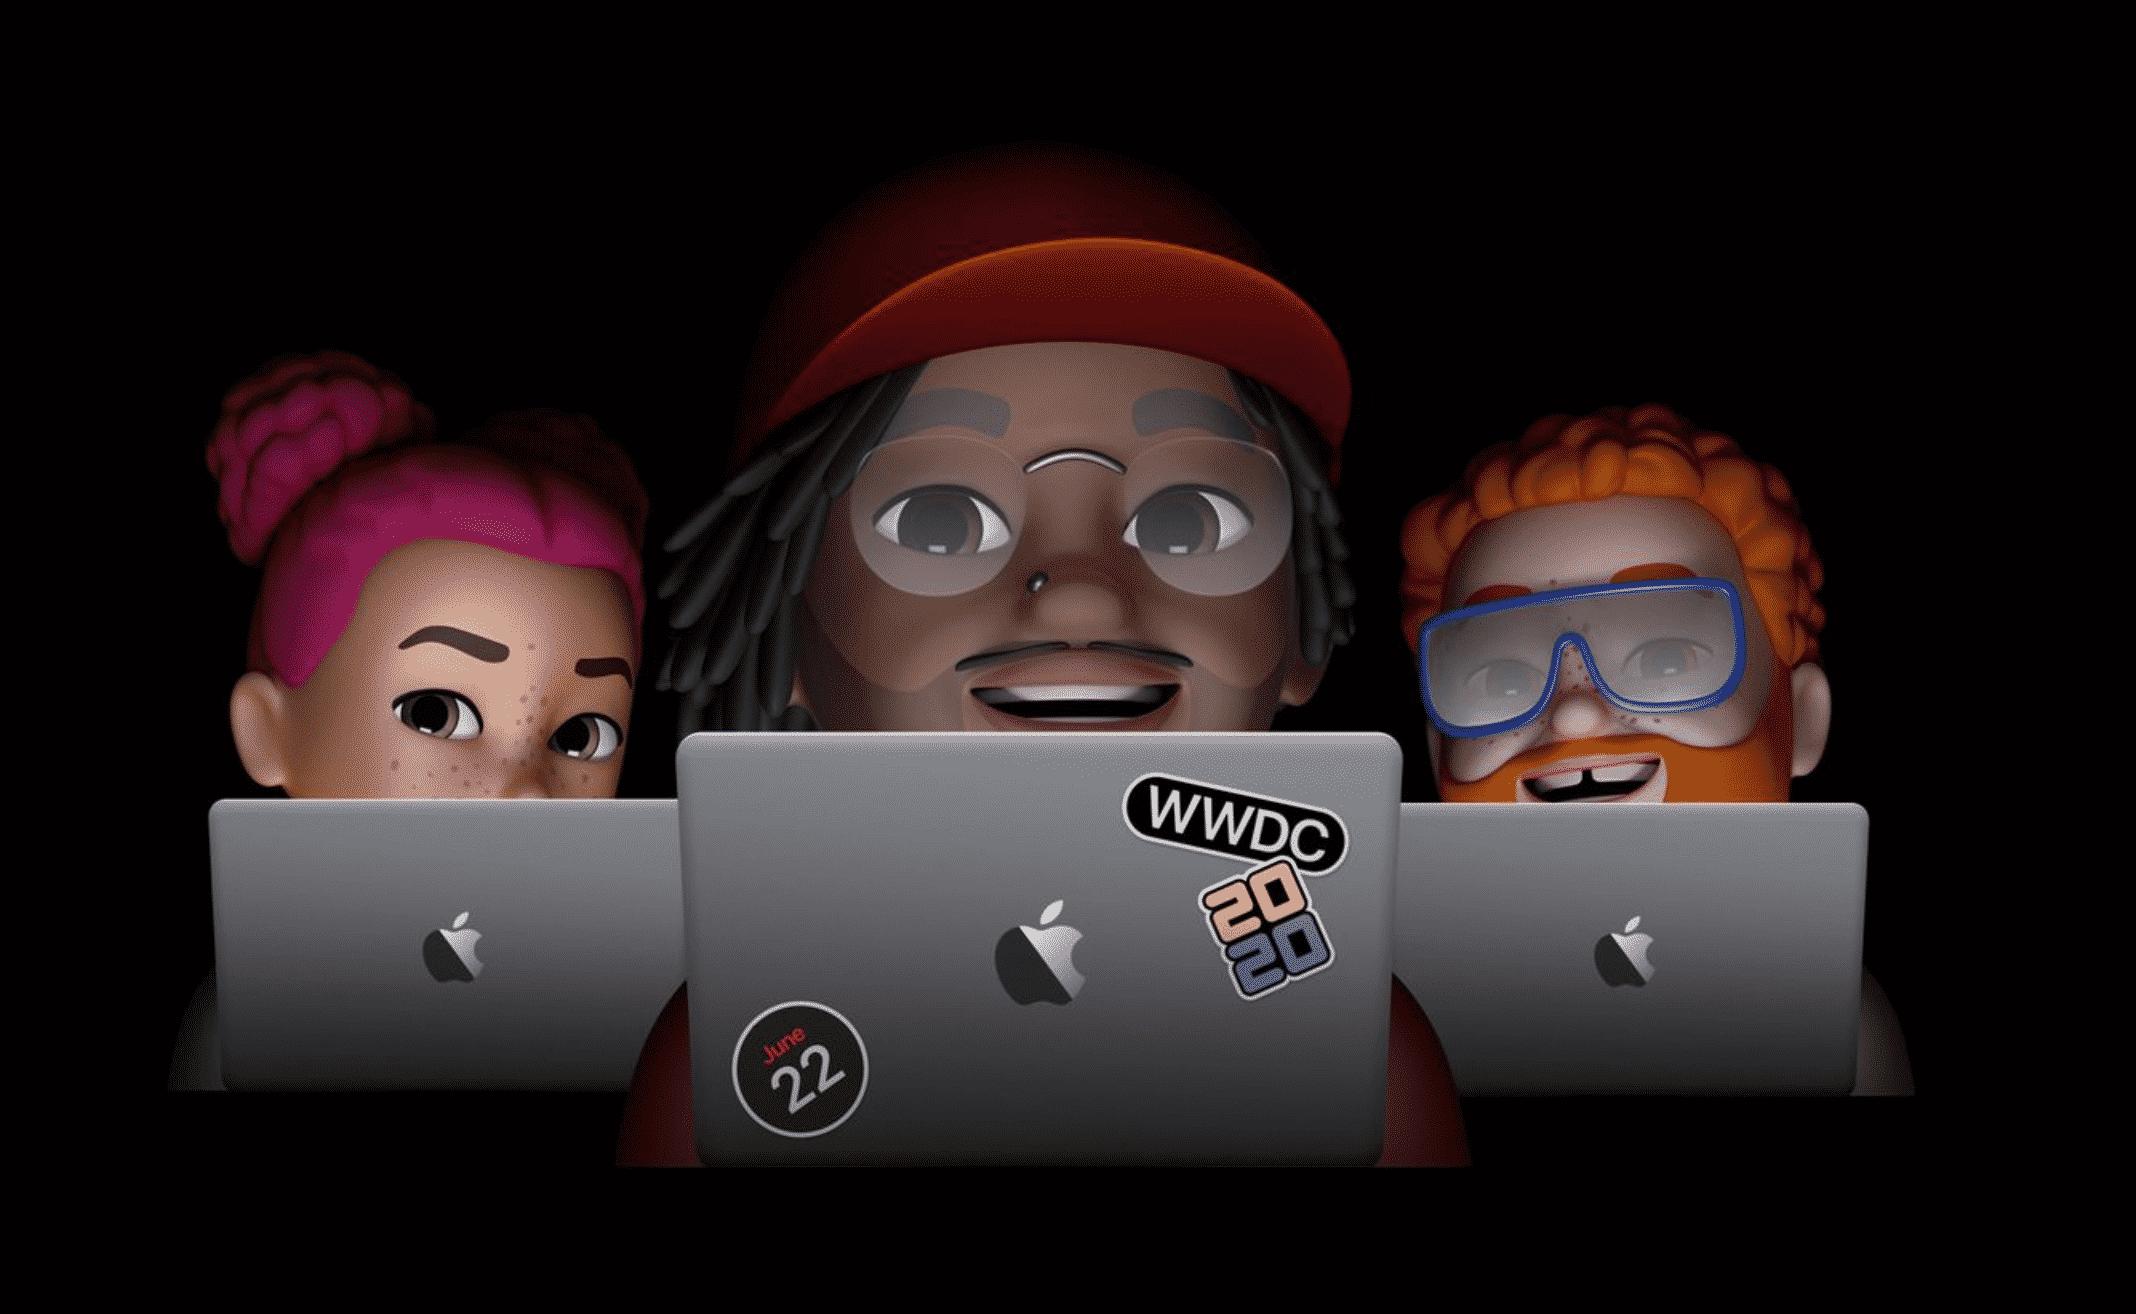 Virtual WWDC event